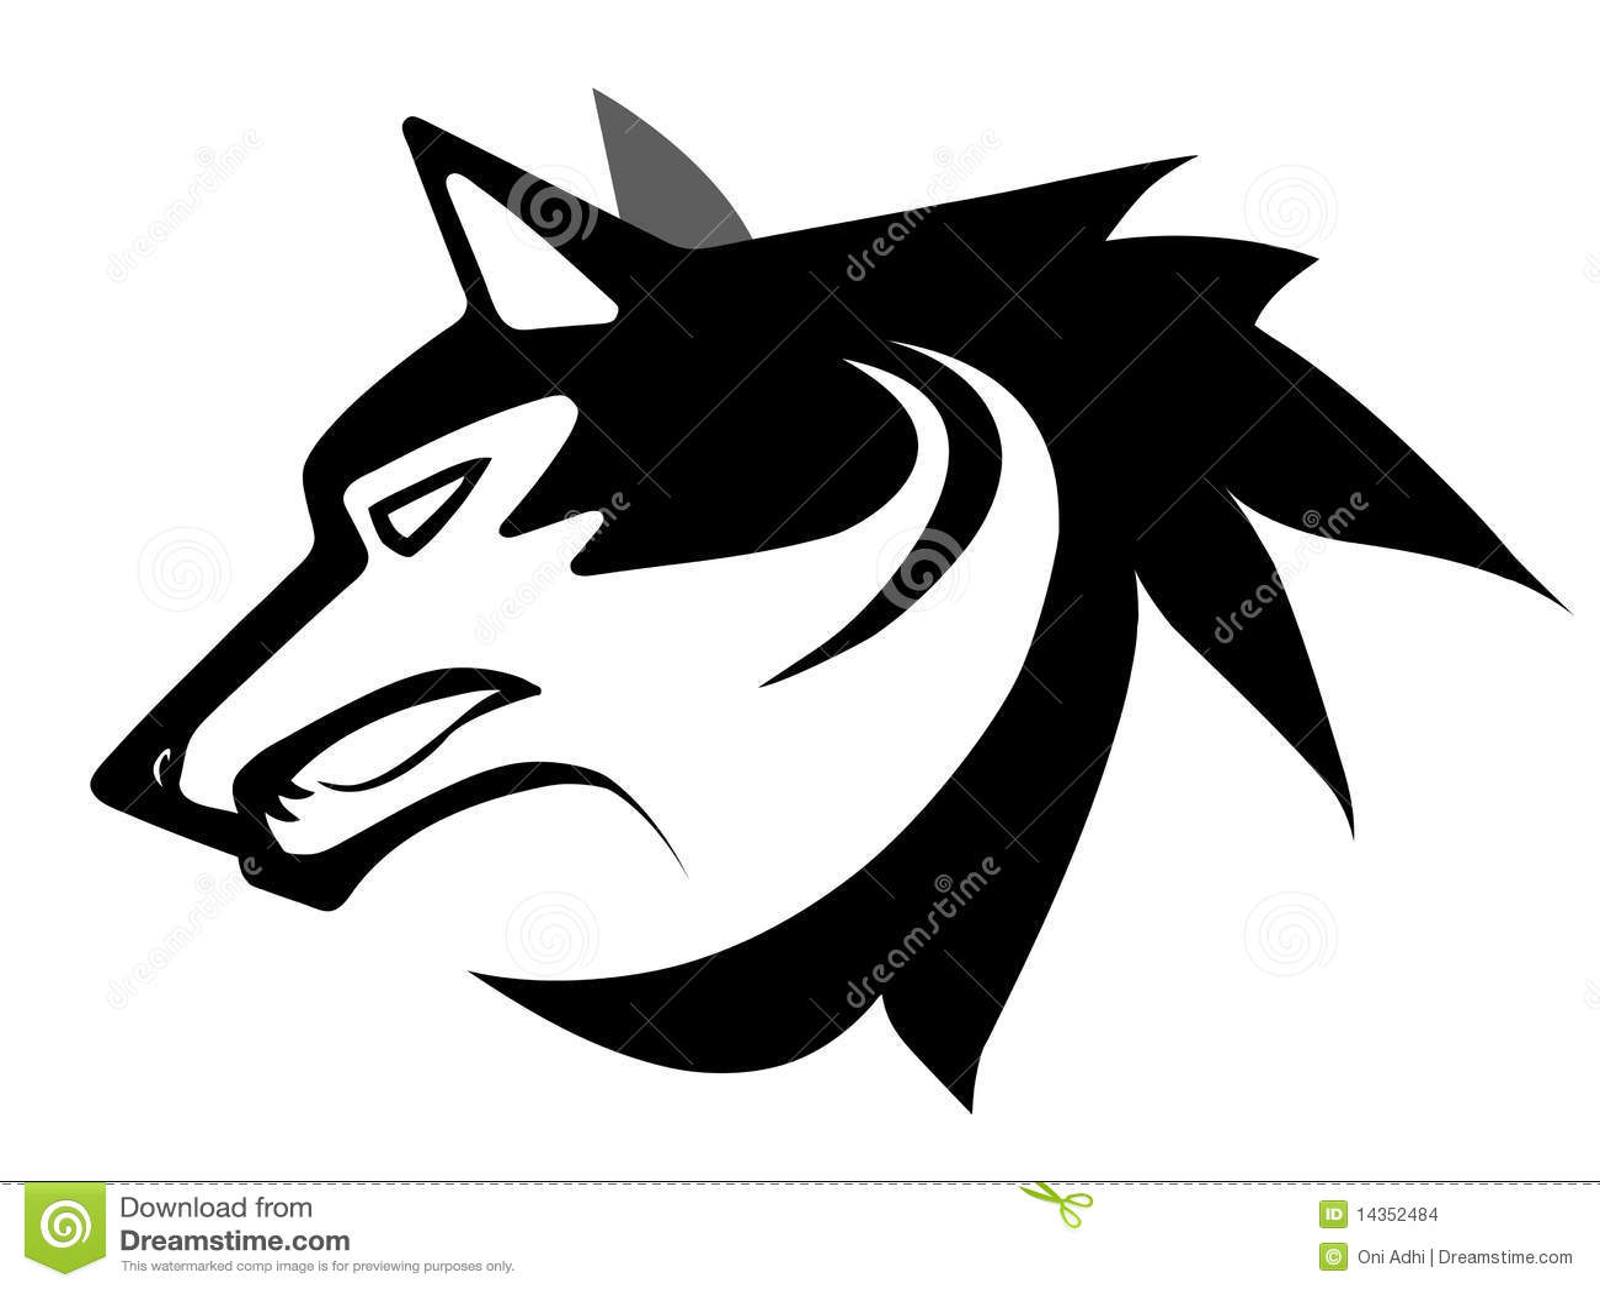 Tatuagem da face do lobo imagens de stock imagem 14352484 for Immagini vector